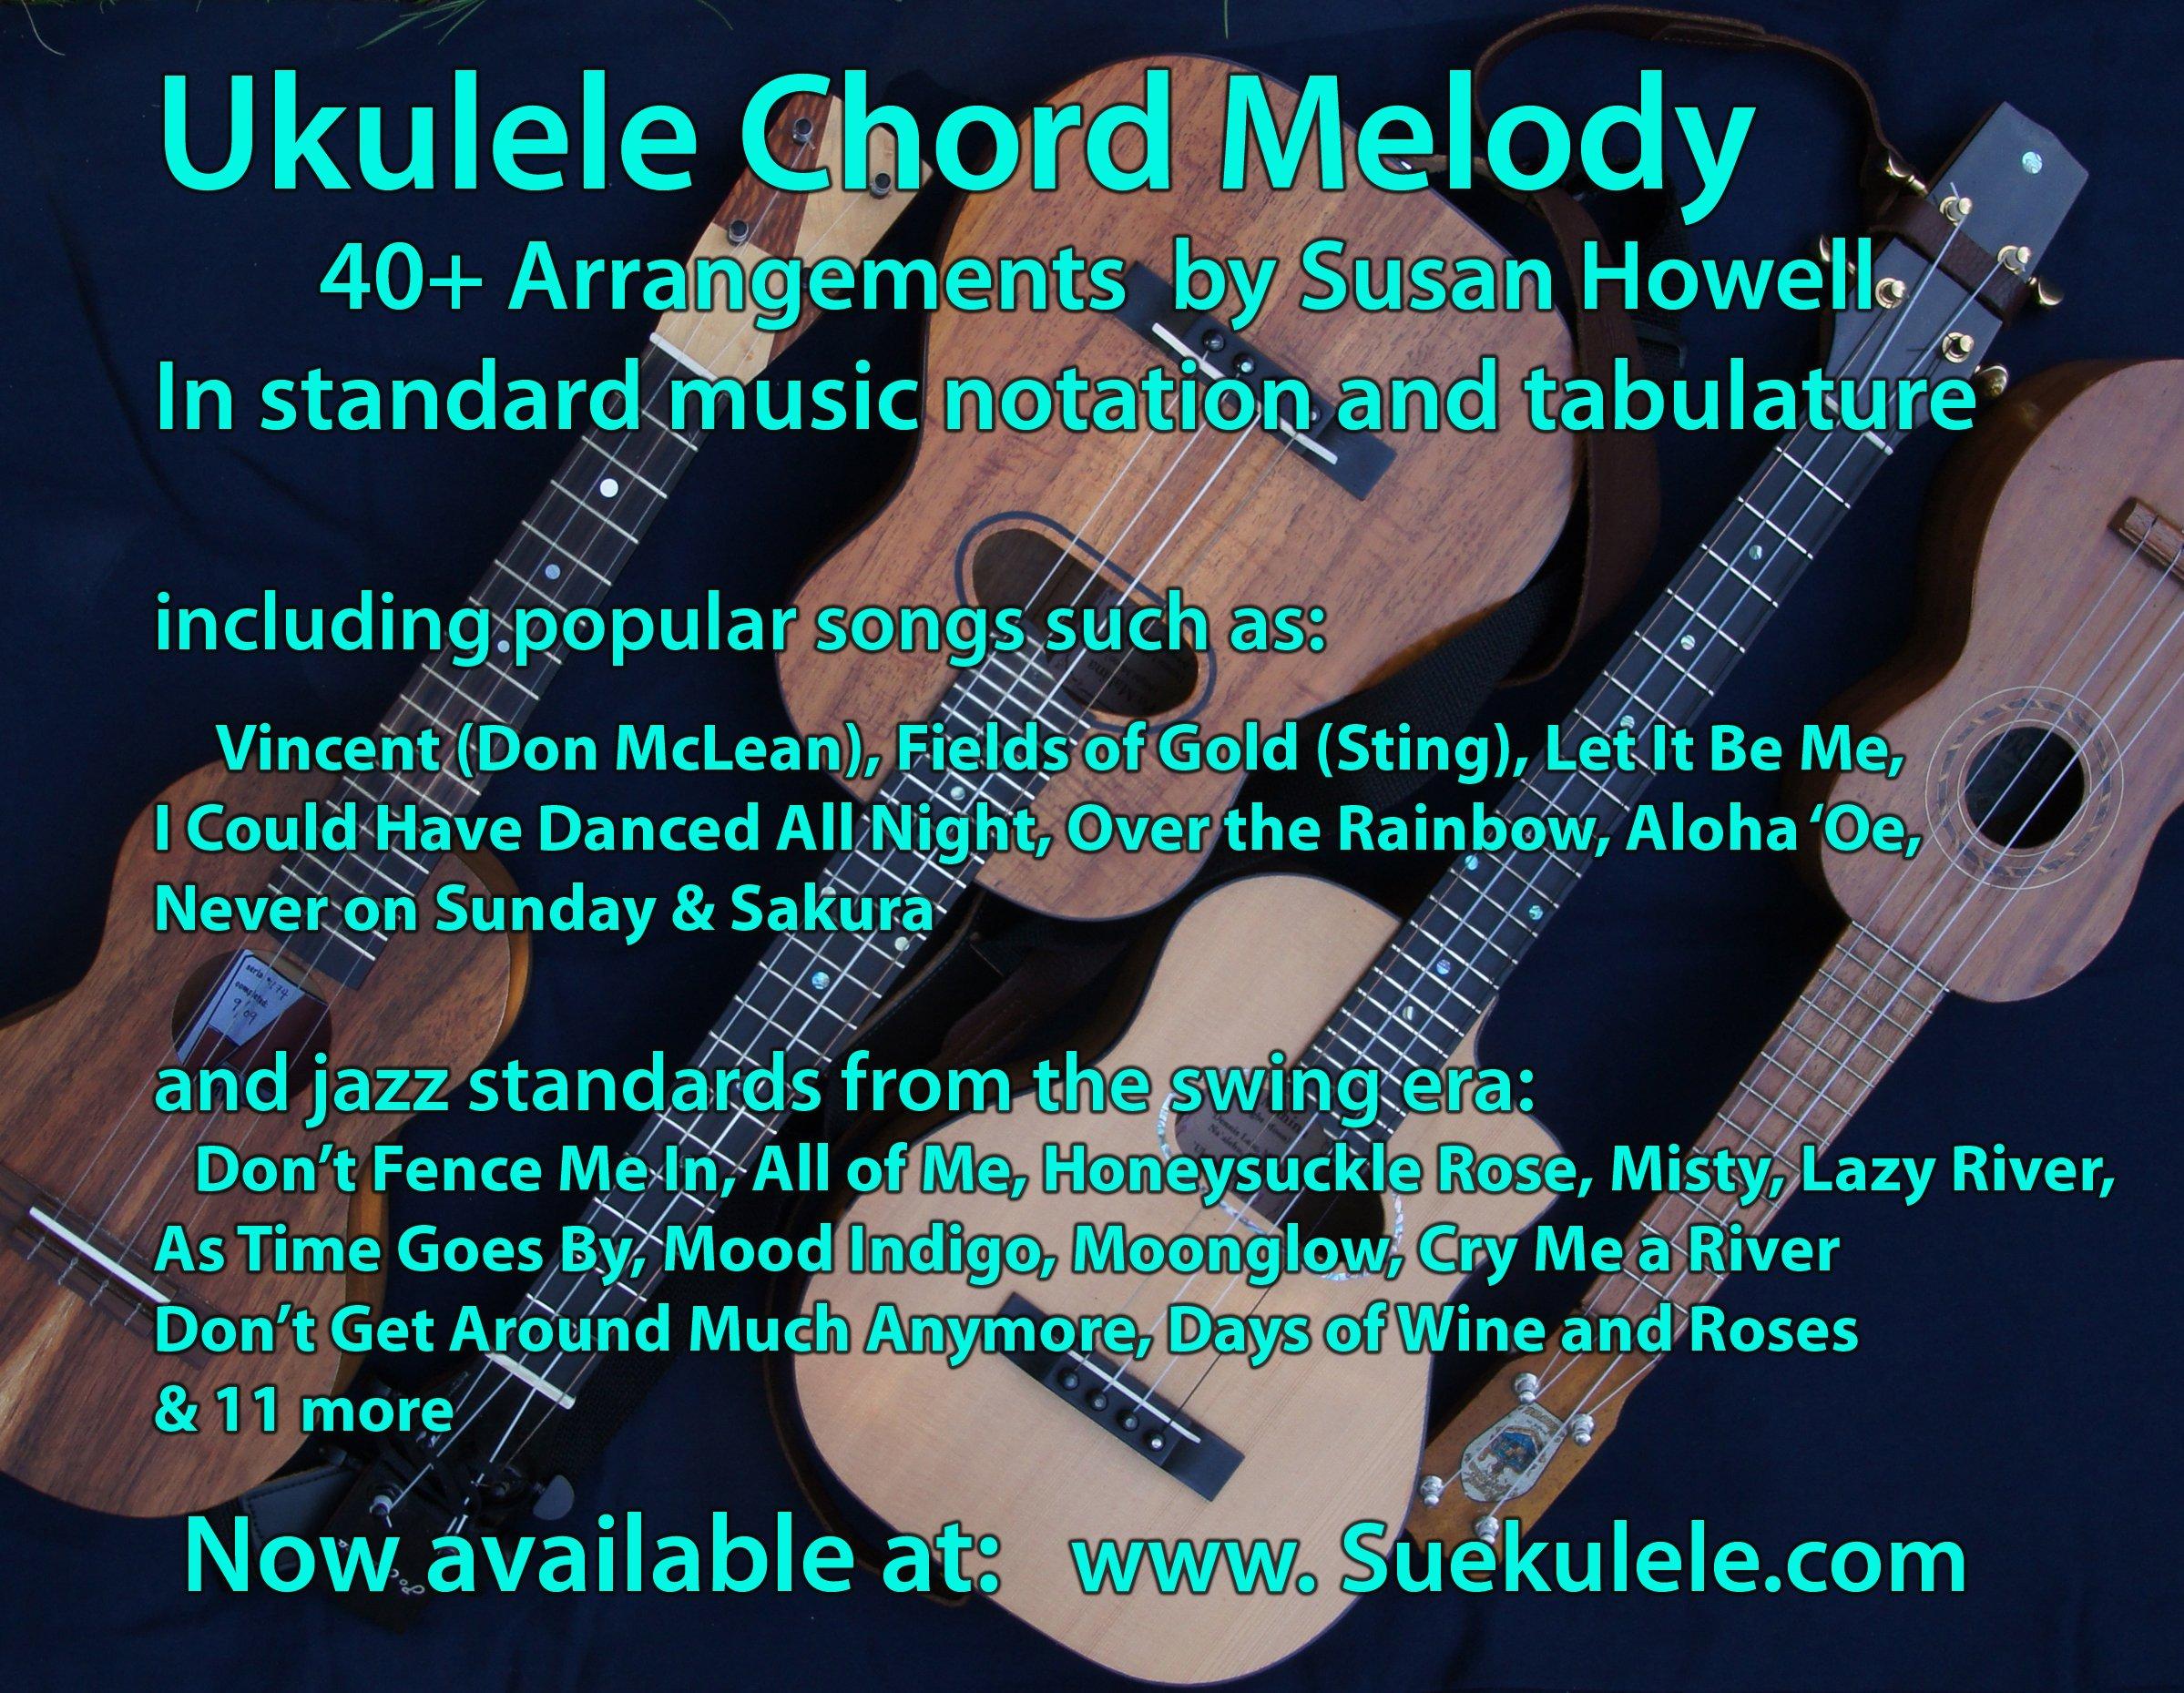 Ukulele Chord Melody 40 Arrangements In Standard Music Notation